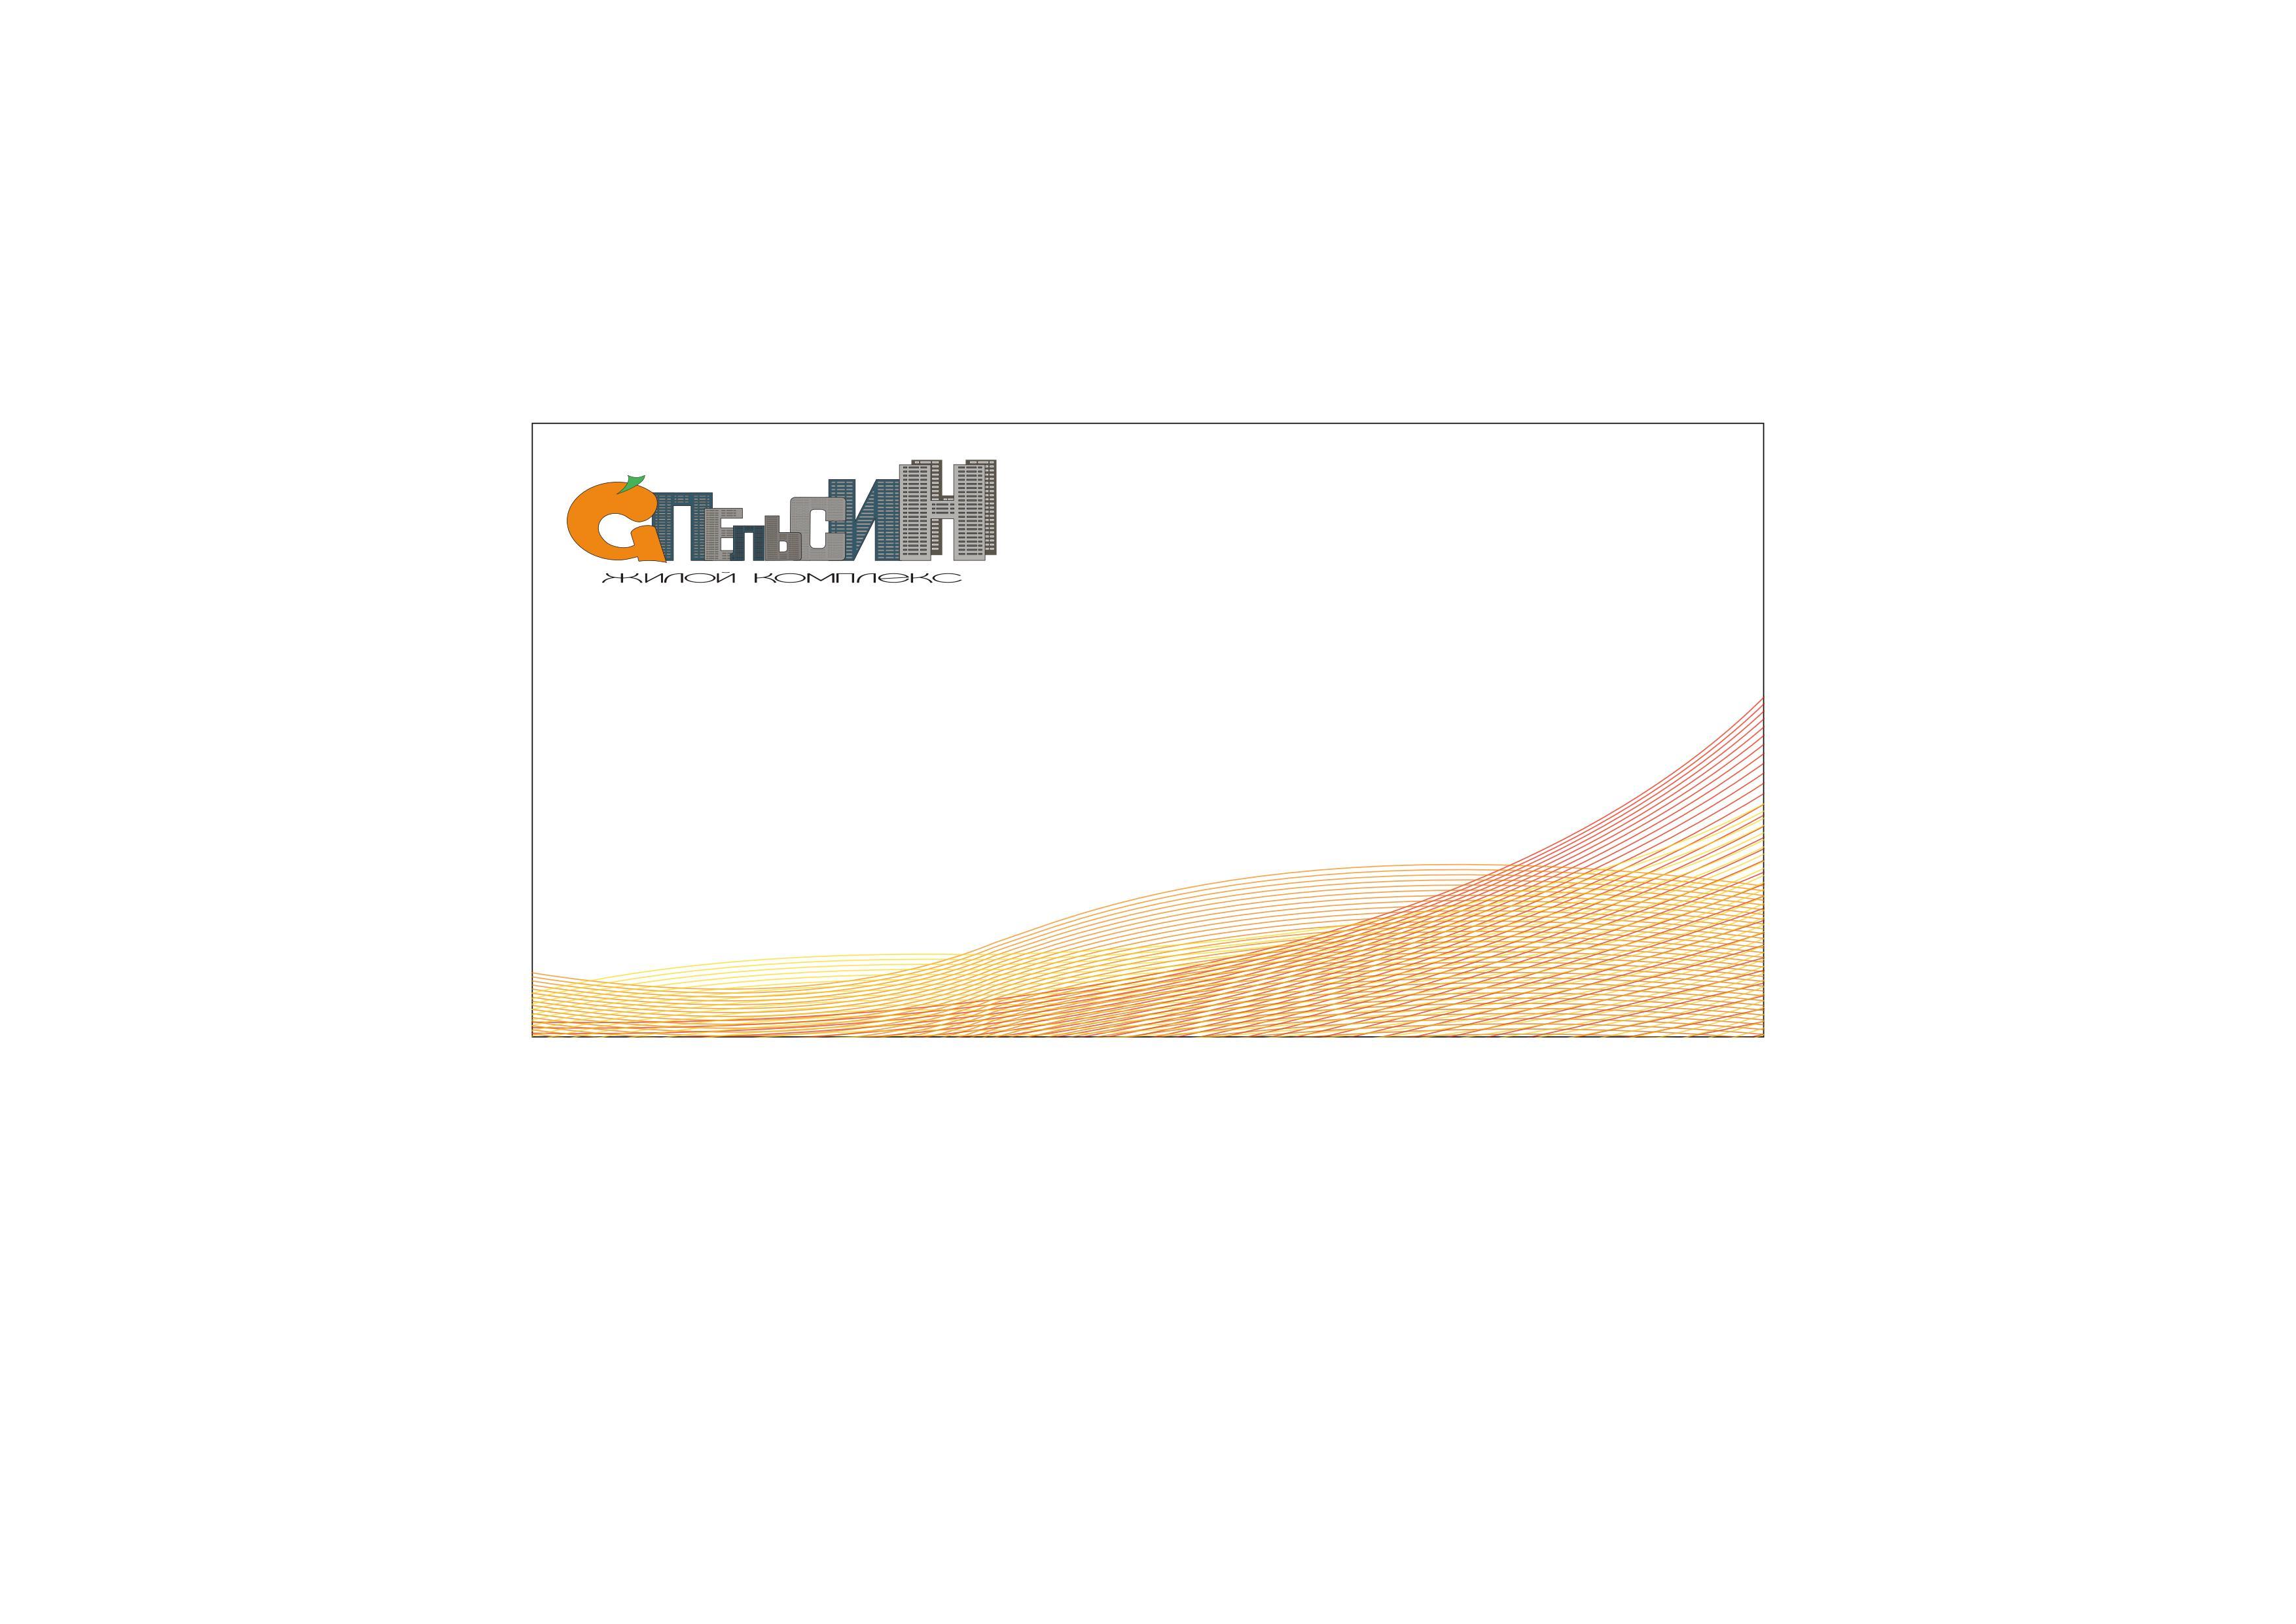 Логотип и фирменный стиль фото f_2965a688f0b4606b.jpg